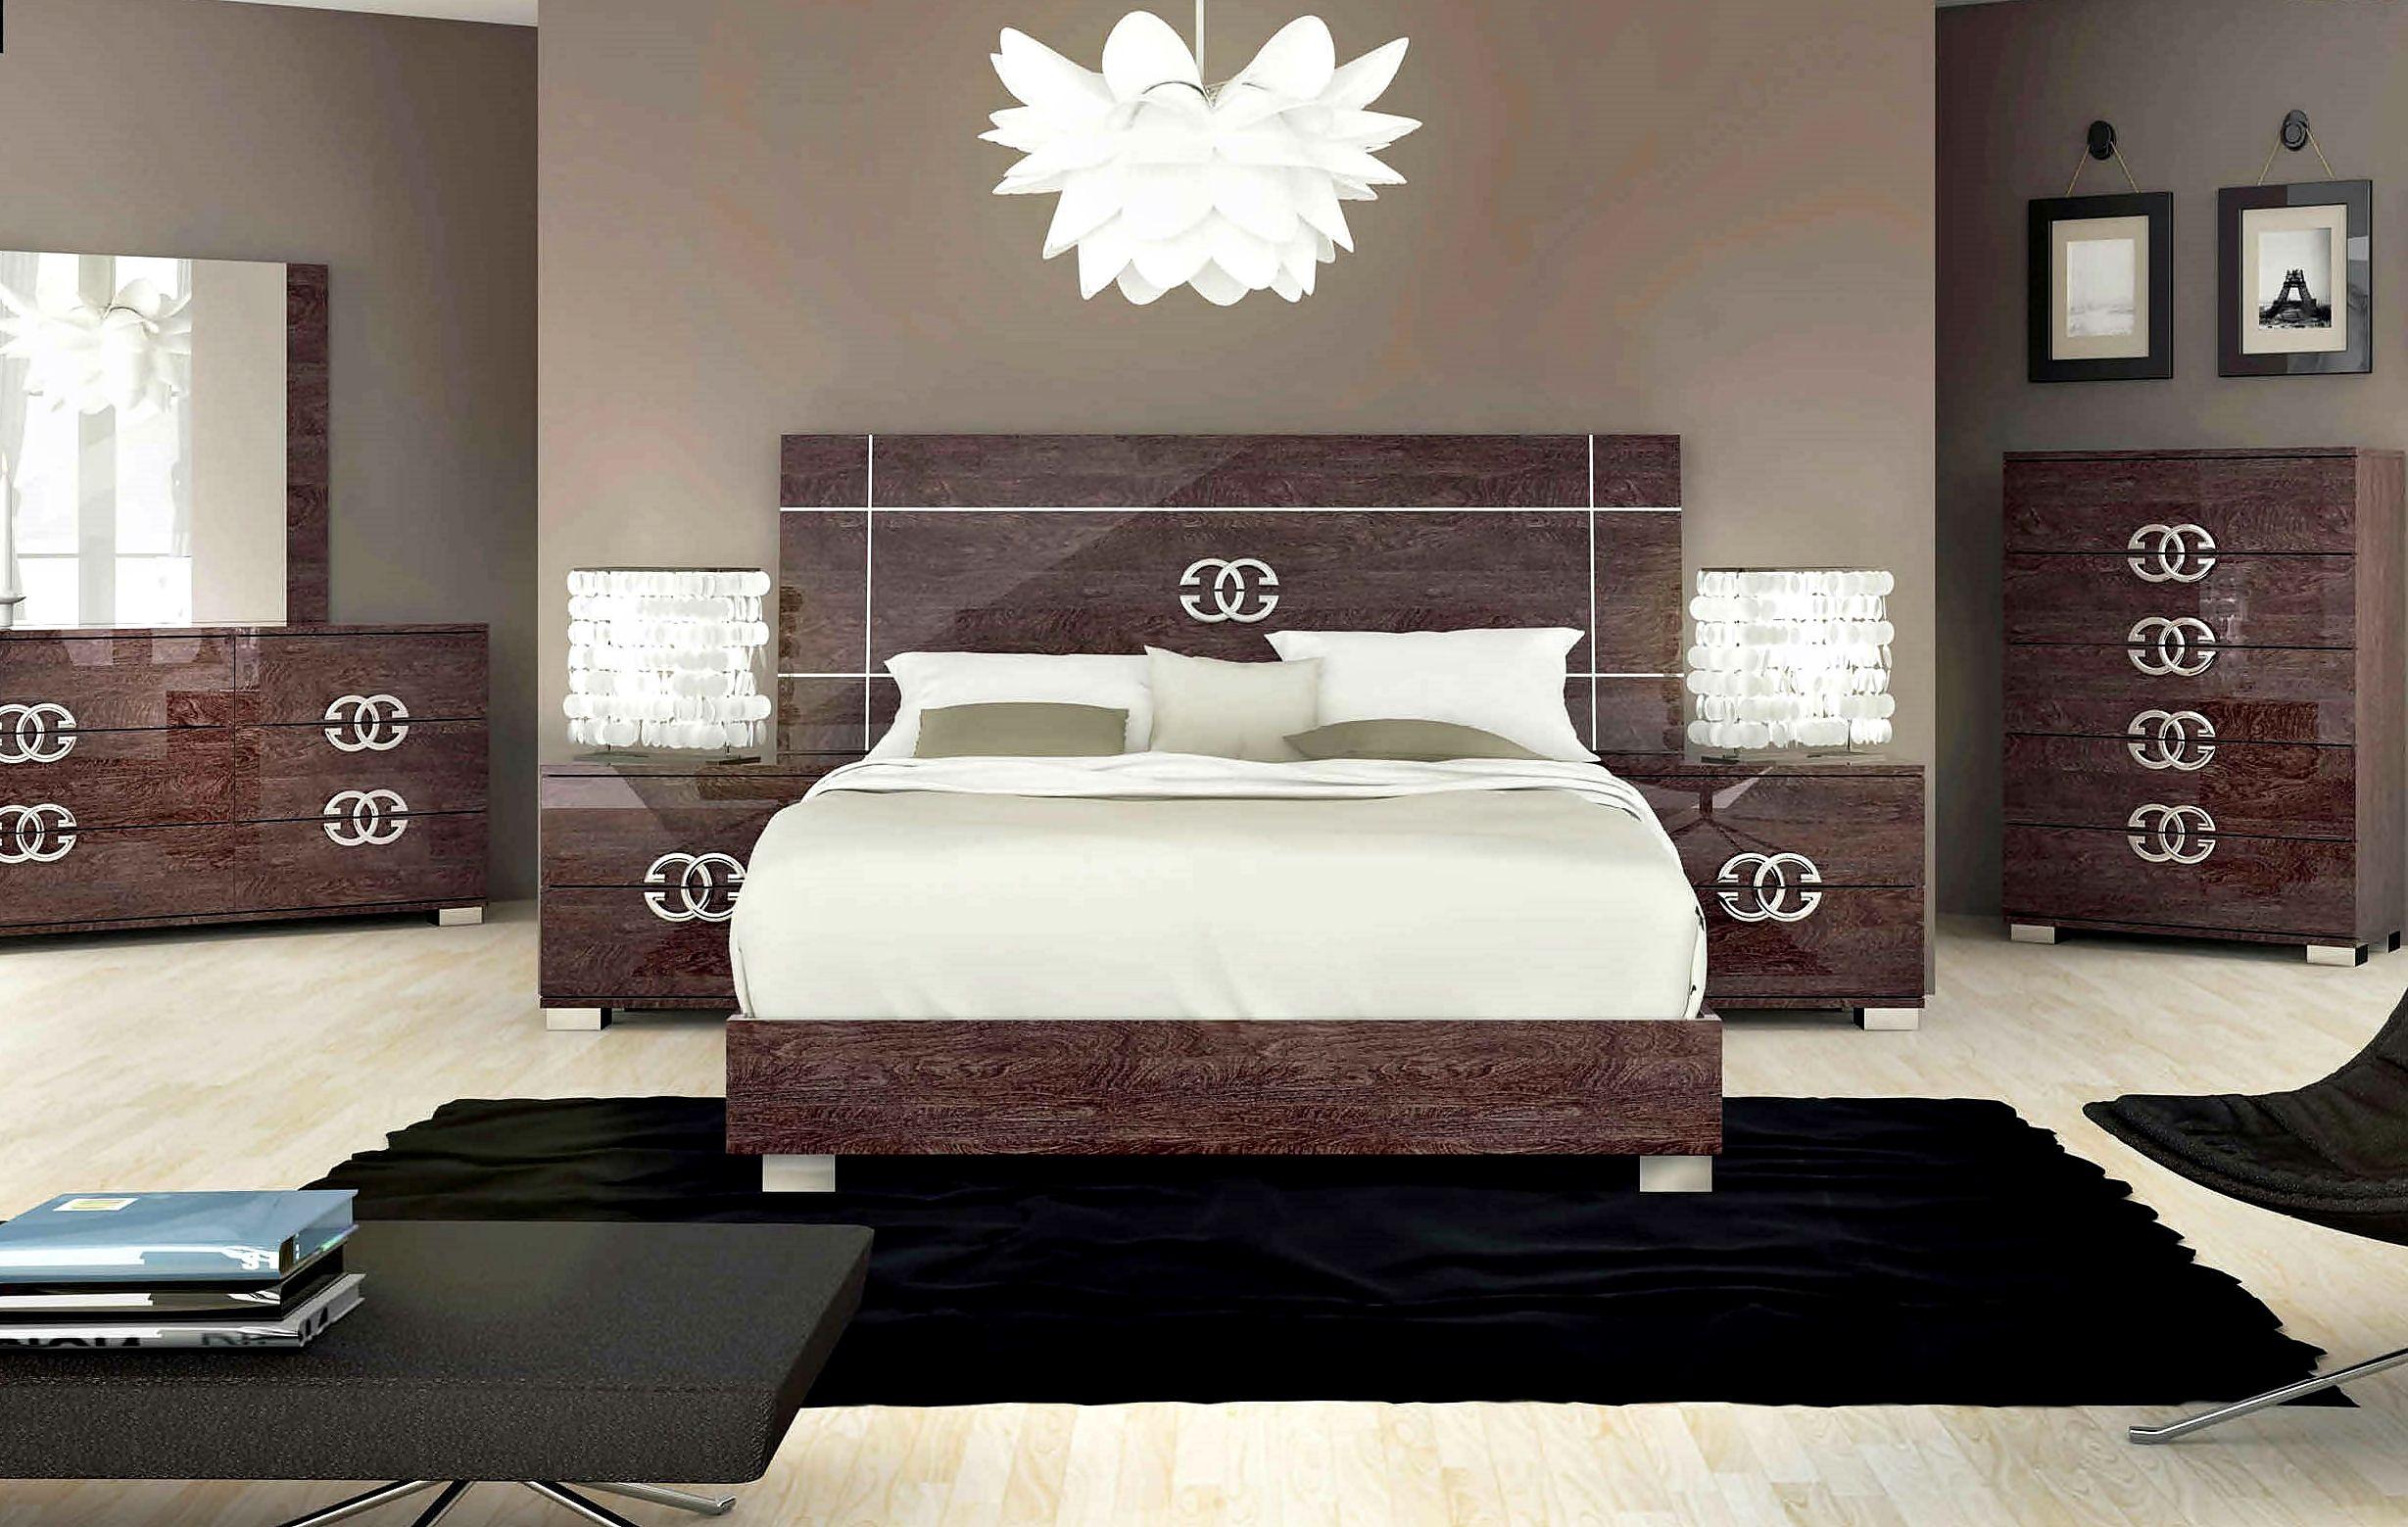 trend home interior design 2011 modern furniture sofa in 2019 rh pinterest co uk